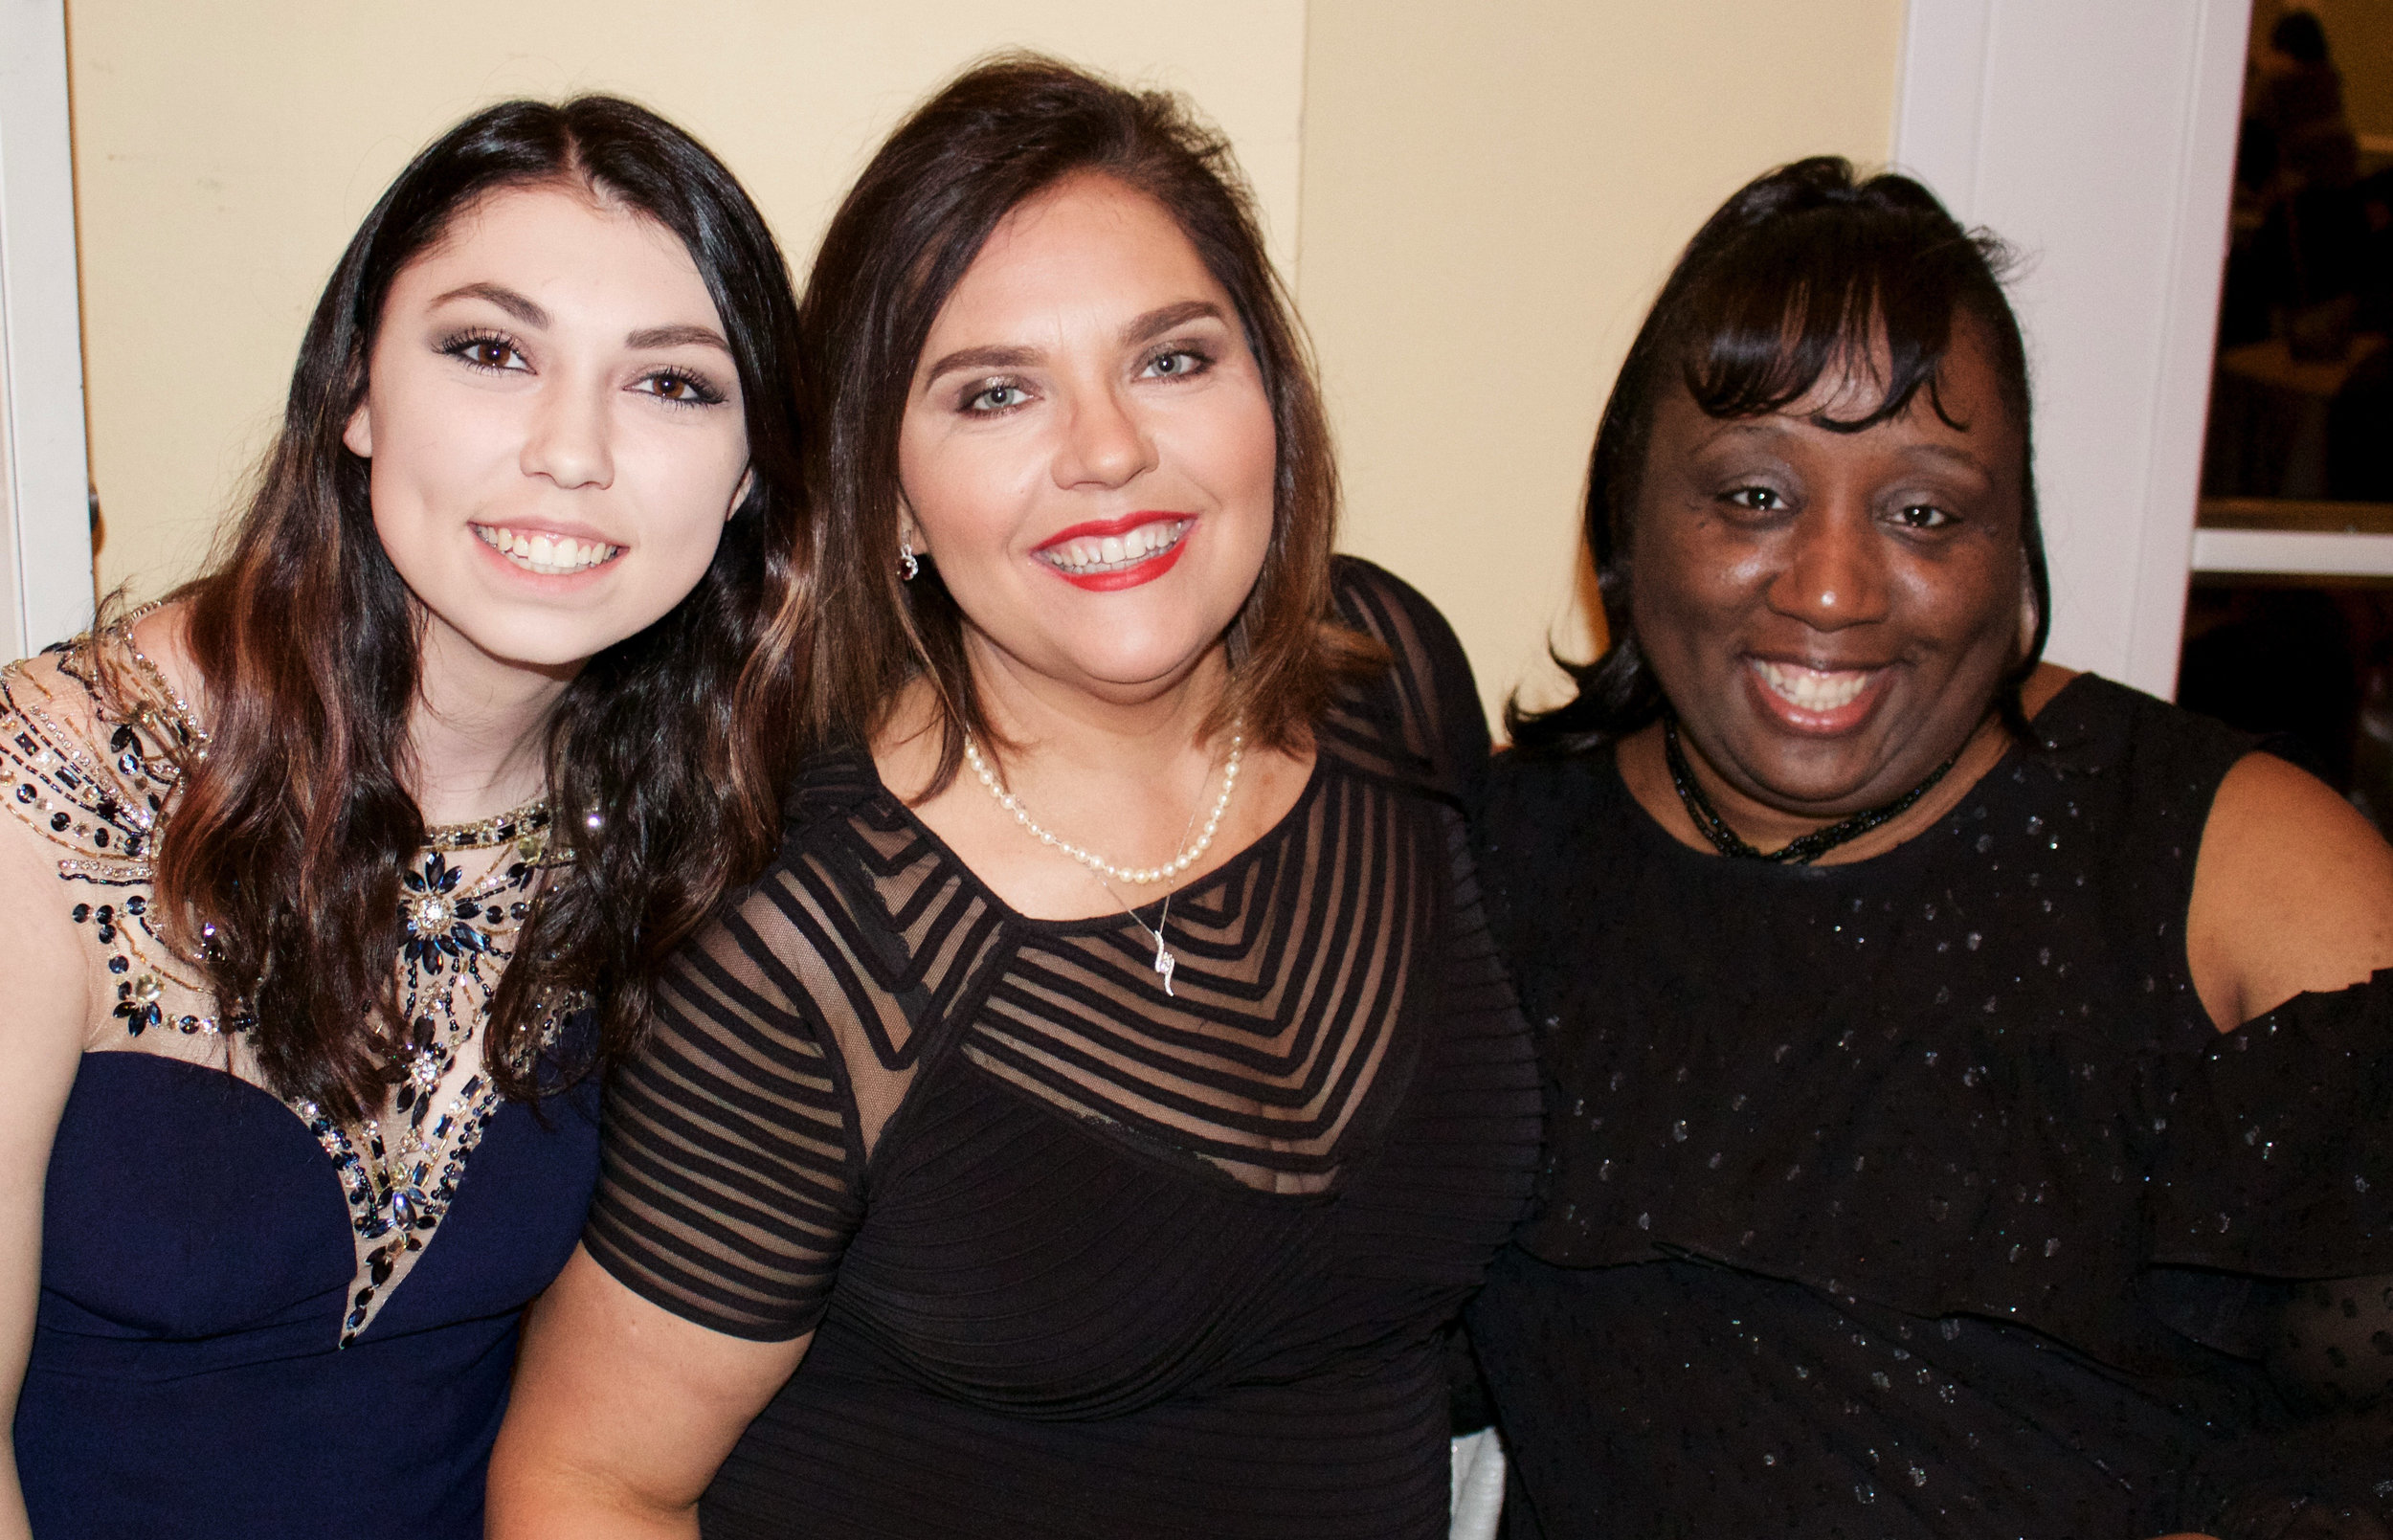 Morgan Pearcy, Carol Pearcy and Lisa Dupree